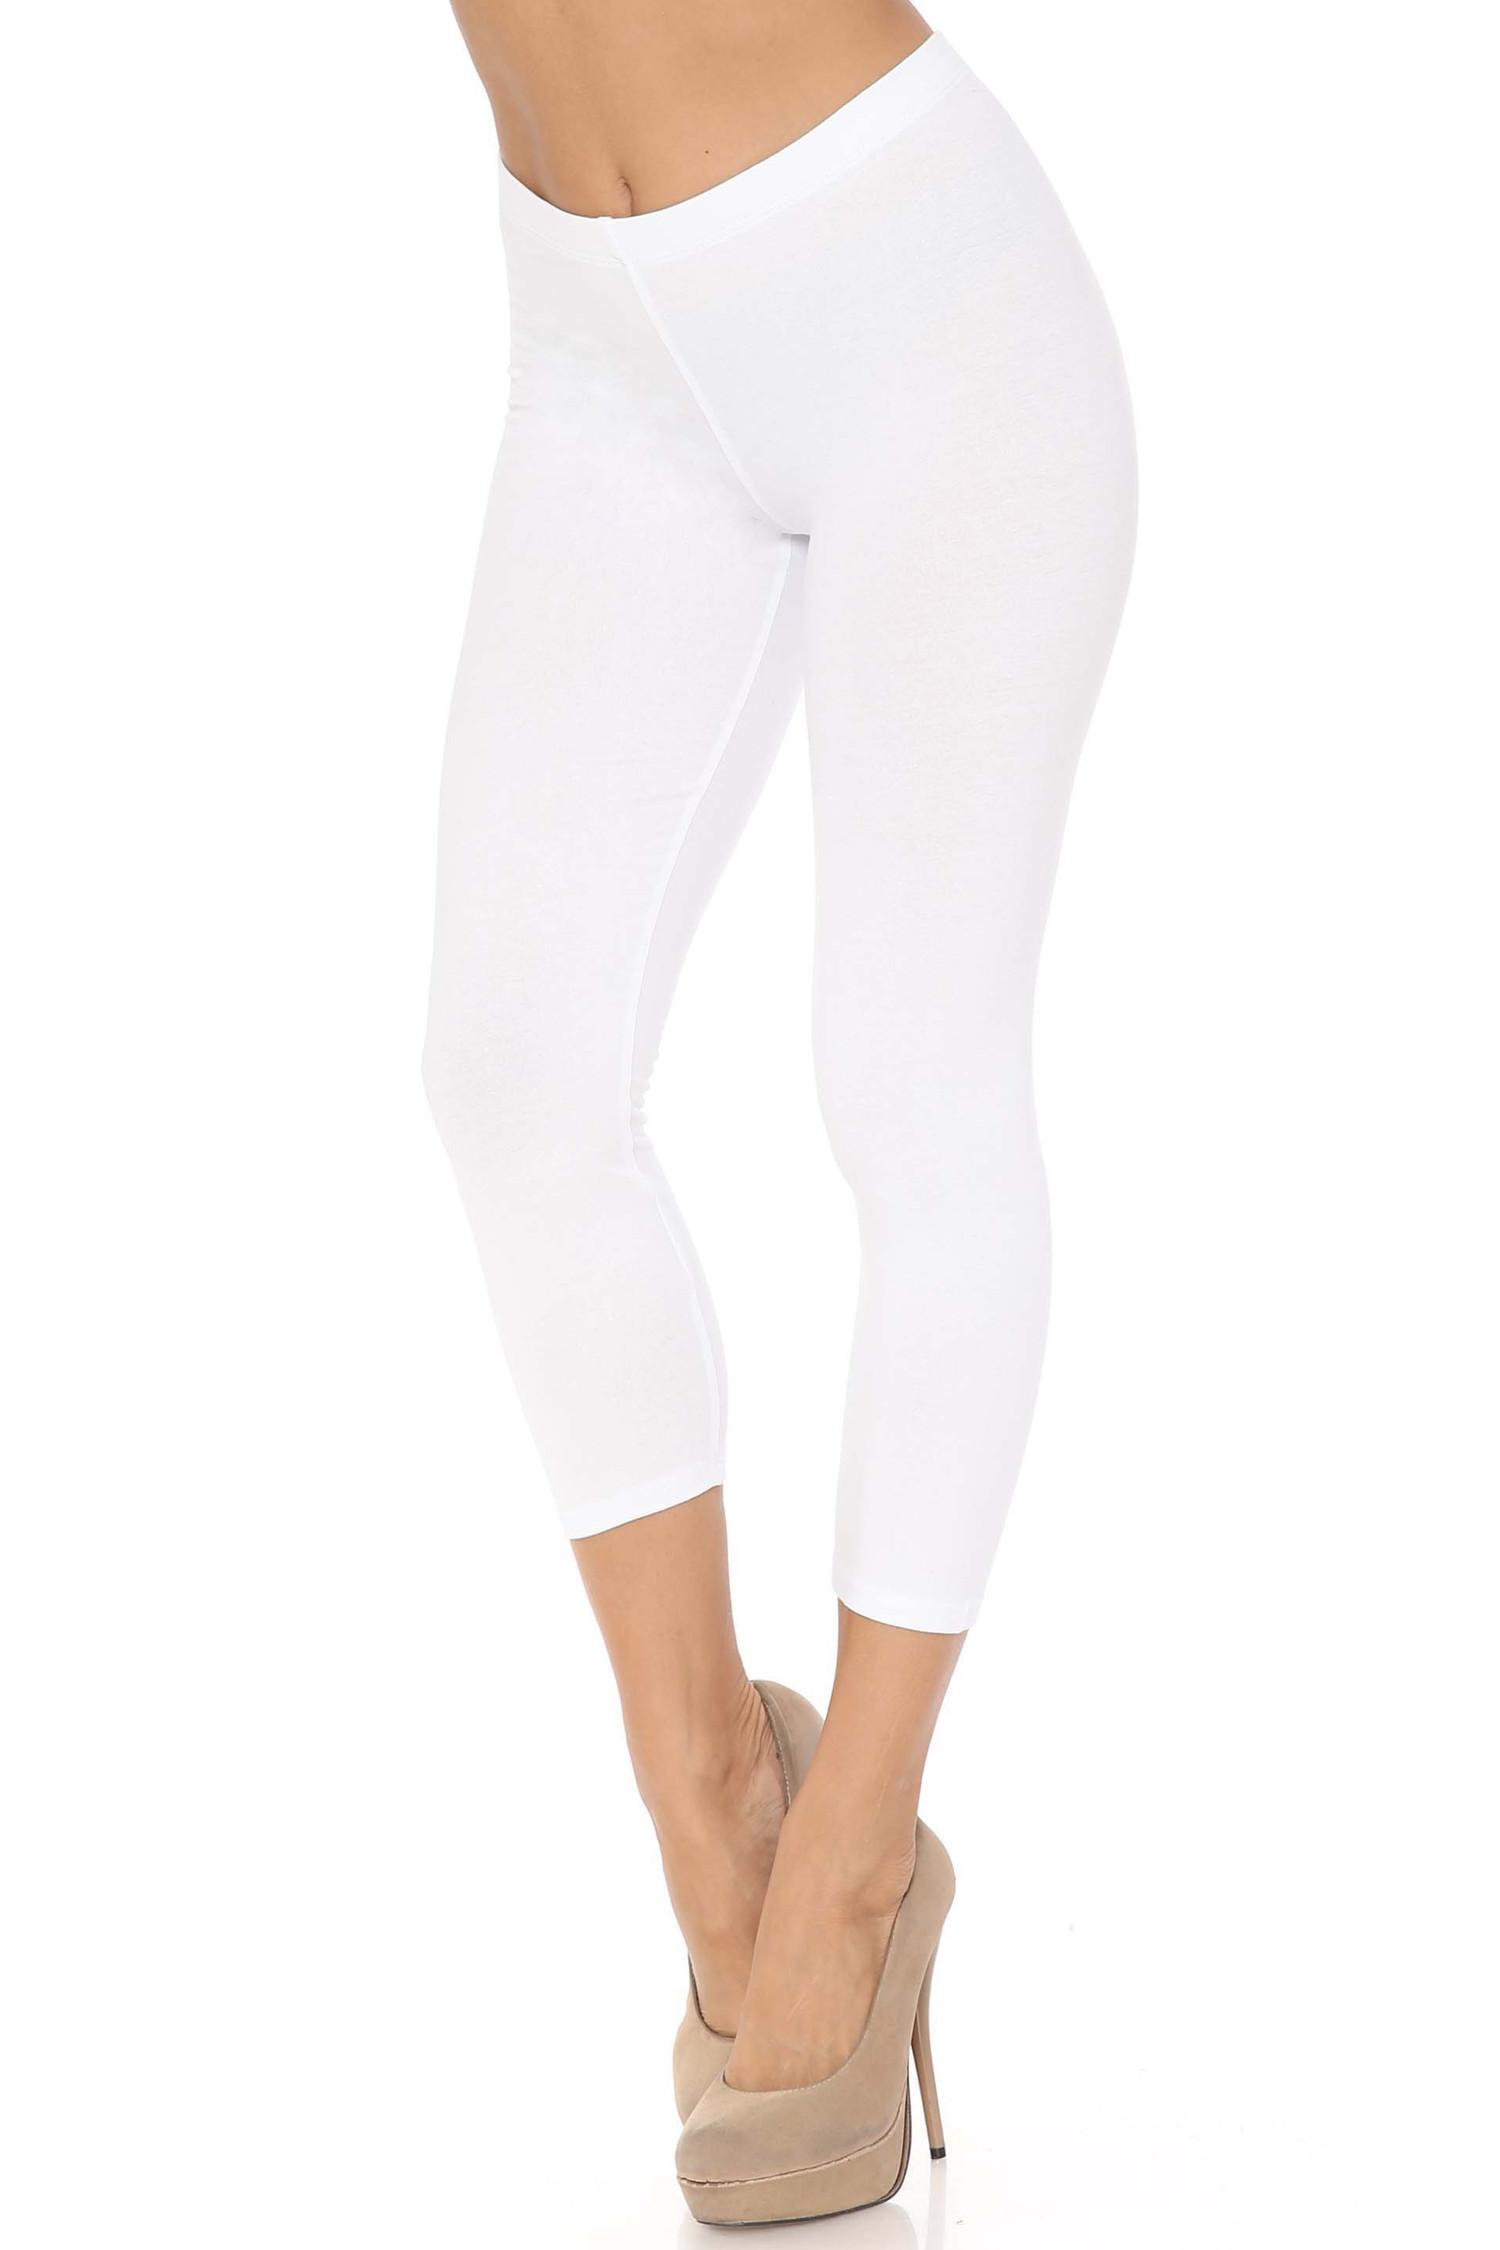 45 degree angle of white USA Cotton Capri Length Leggings